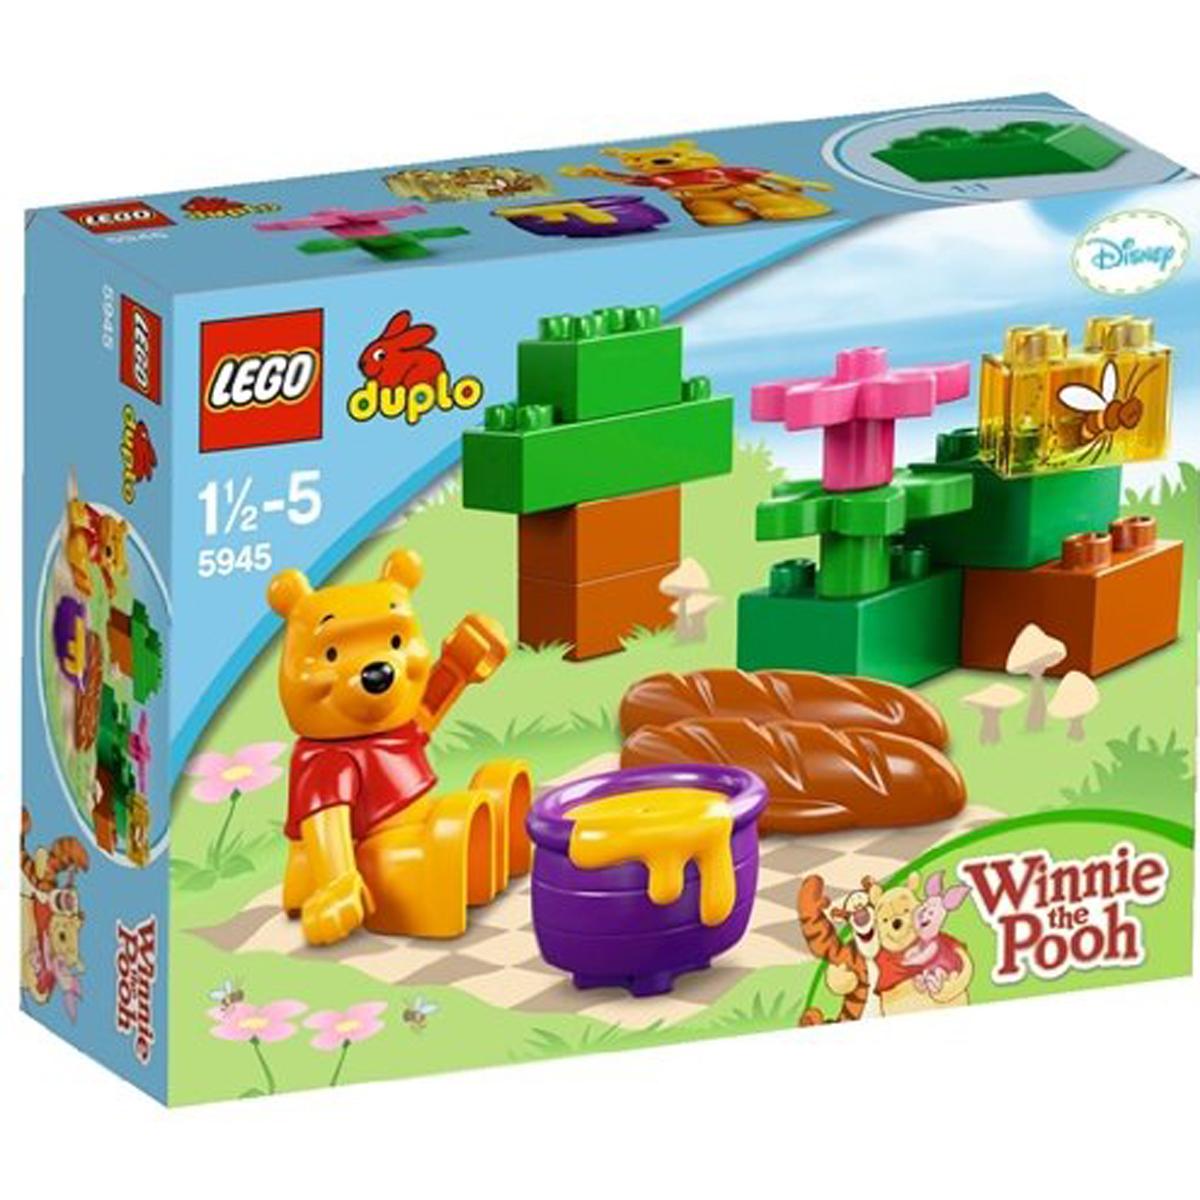 Do choi xep hinh Lego Duplo 5945 - Chuyen da ngoai cua gau Pooh